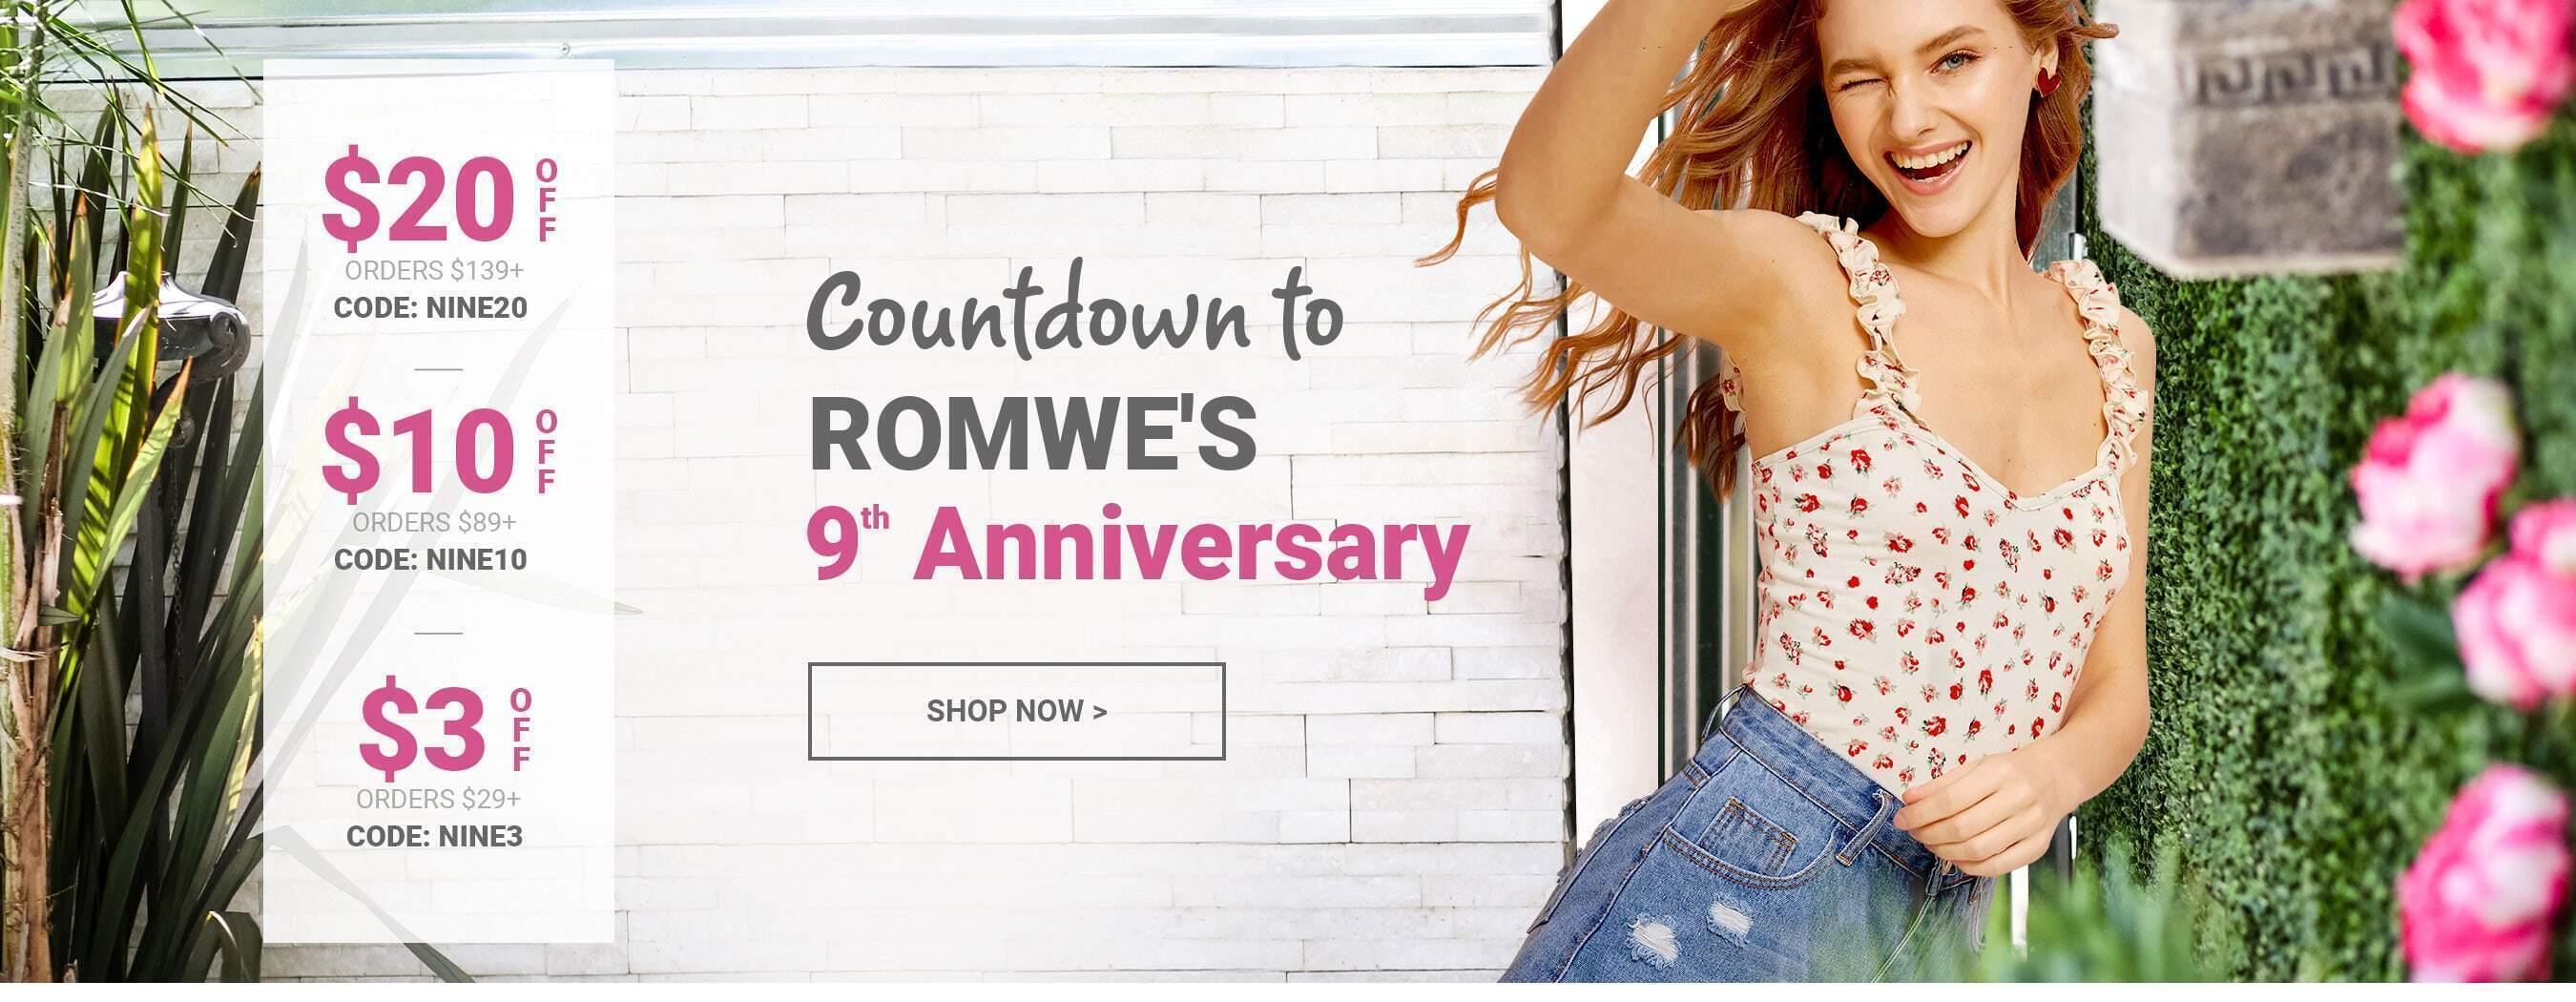 8eddf3c2e Shop The Latest Girls   Guys Fashion Trends at ROMWE